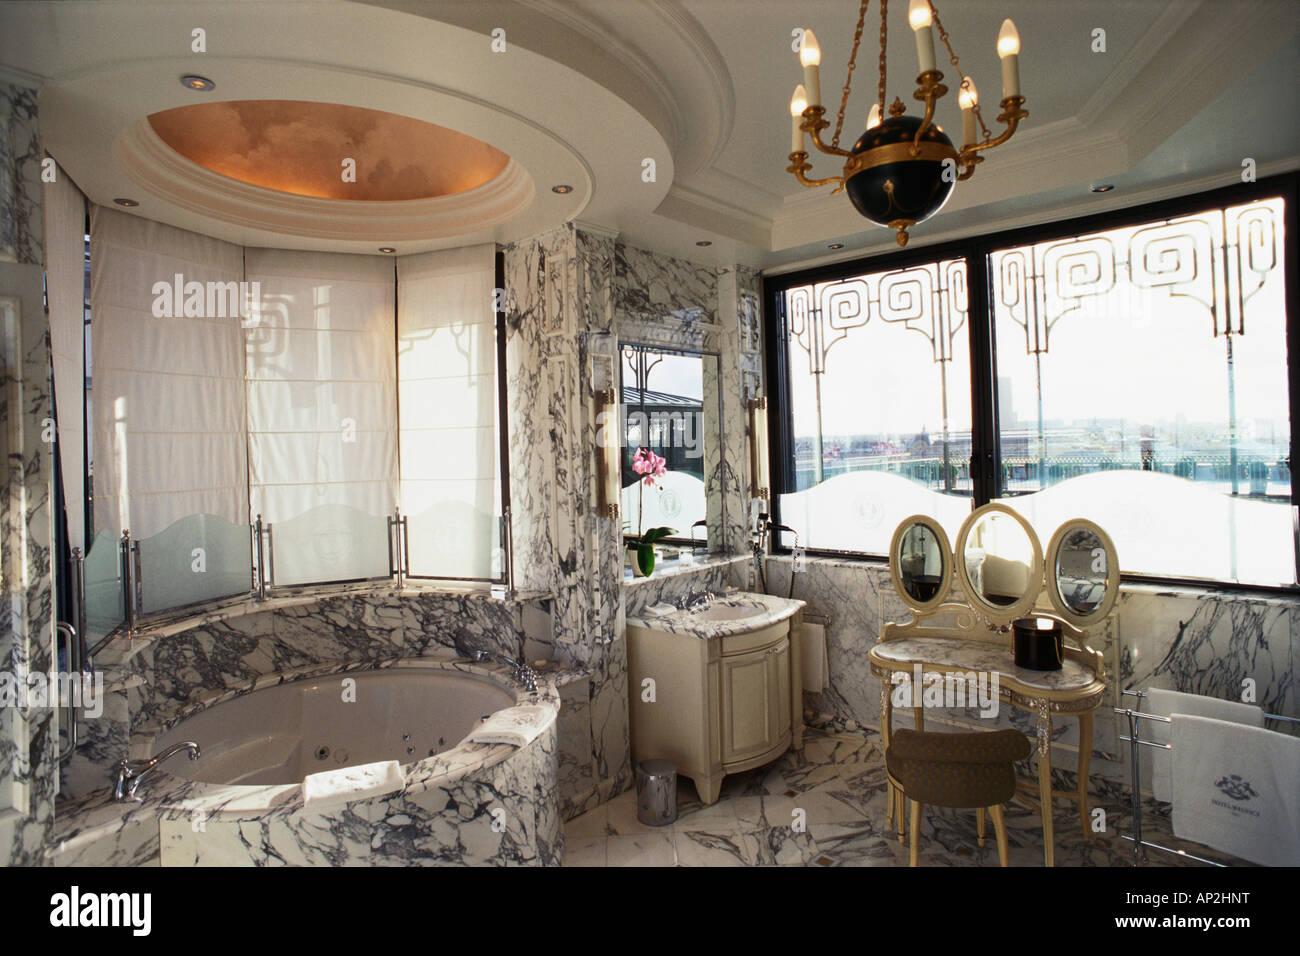 Marmor Badezimmersuite Und Jacuzzi Bad In Suite La Belle Etoile, Luxus  Hotel Le Meurice, Unterkunft, Paris, Frankreich